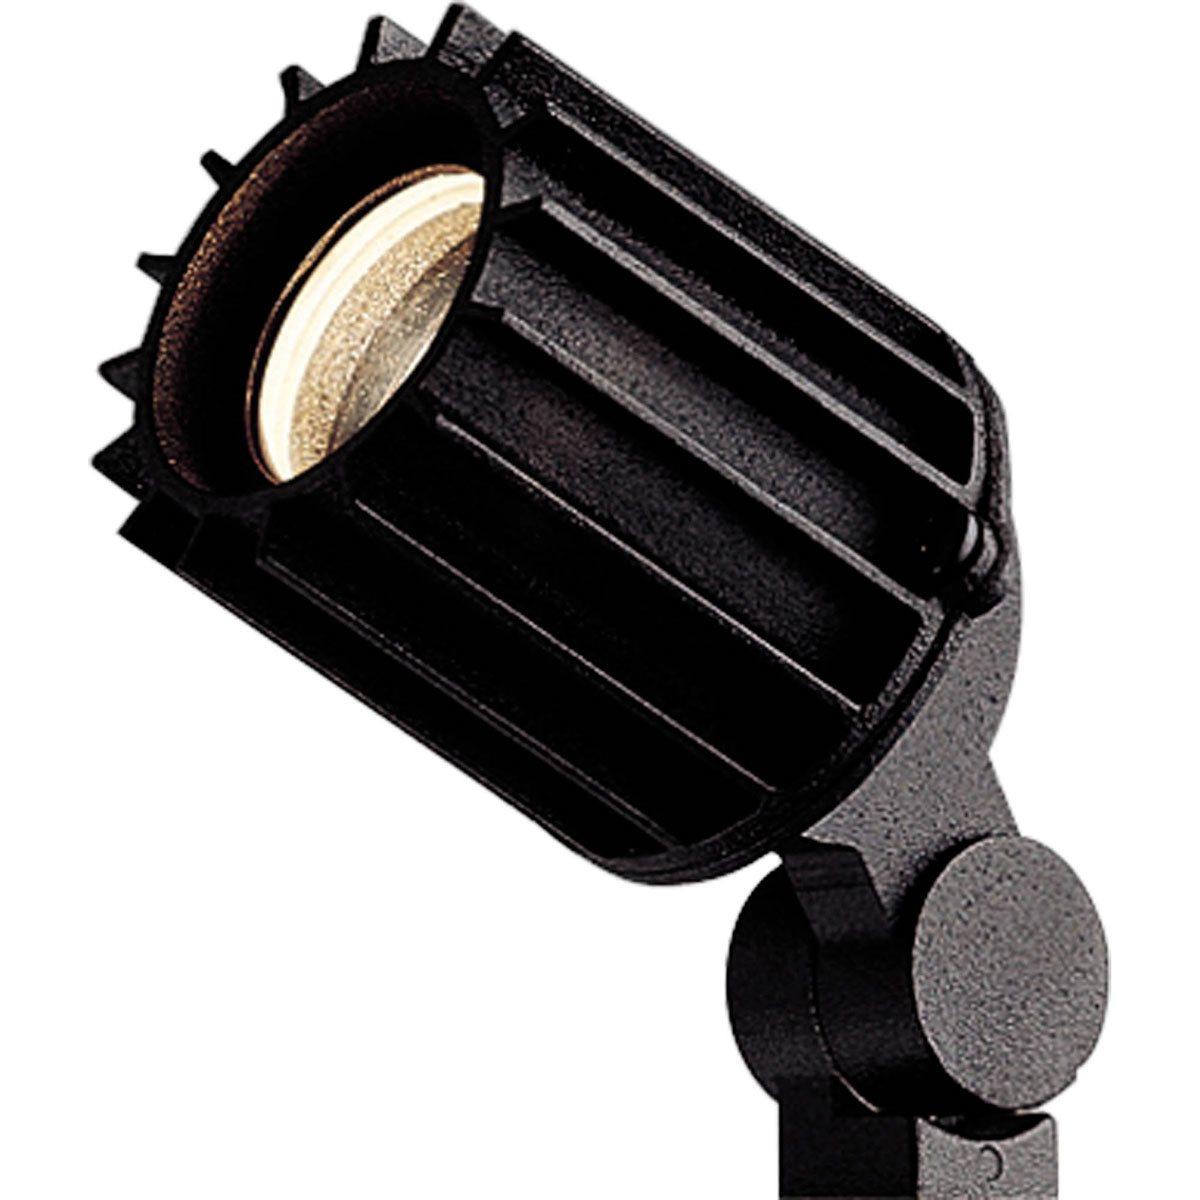 Progress lighting p5230 31 landscape 12v utility spotlight for 12v outdoor lighting fixtures